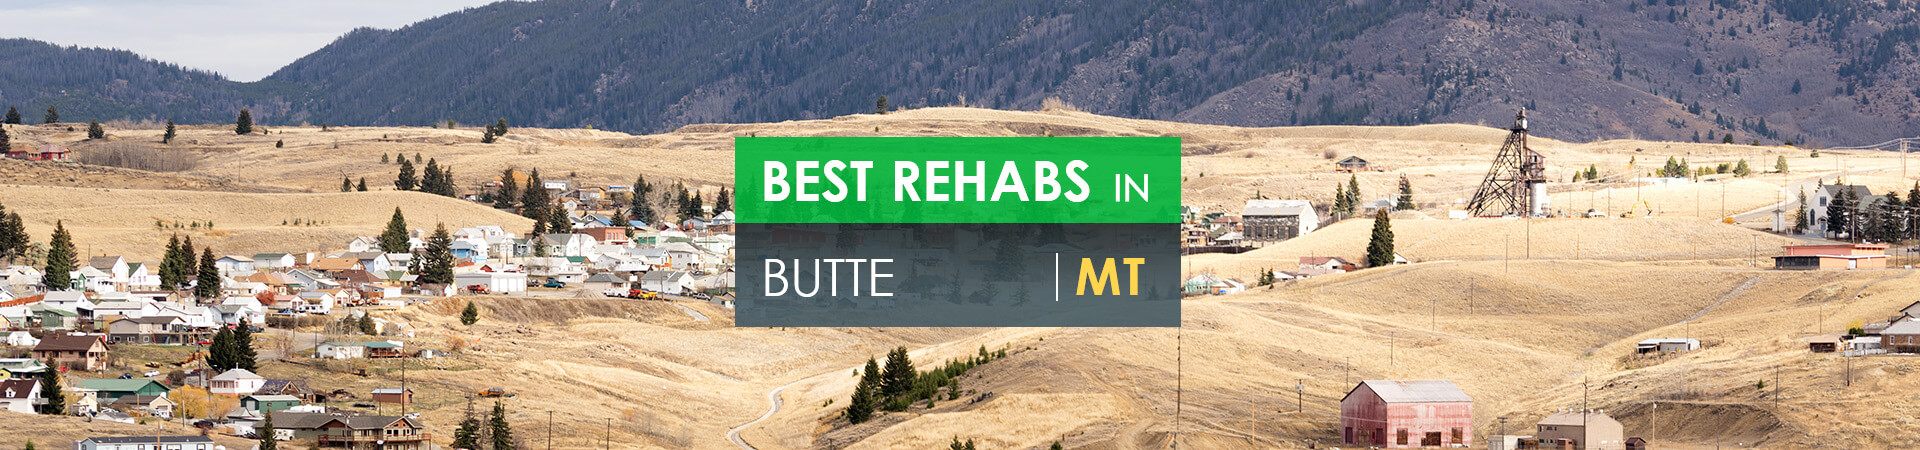 Best rehabs in Butte, MT